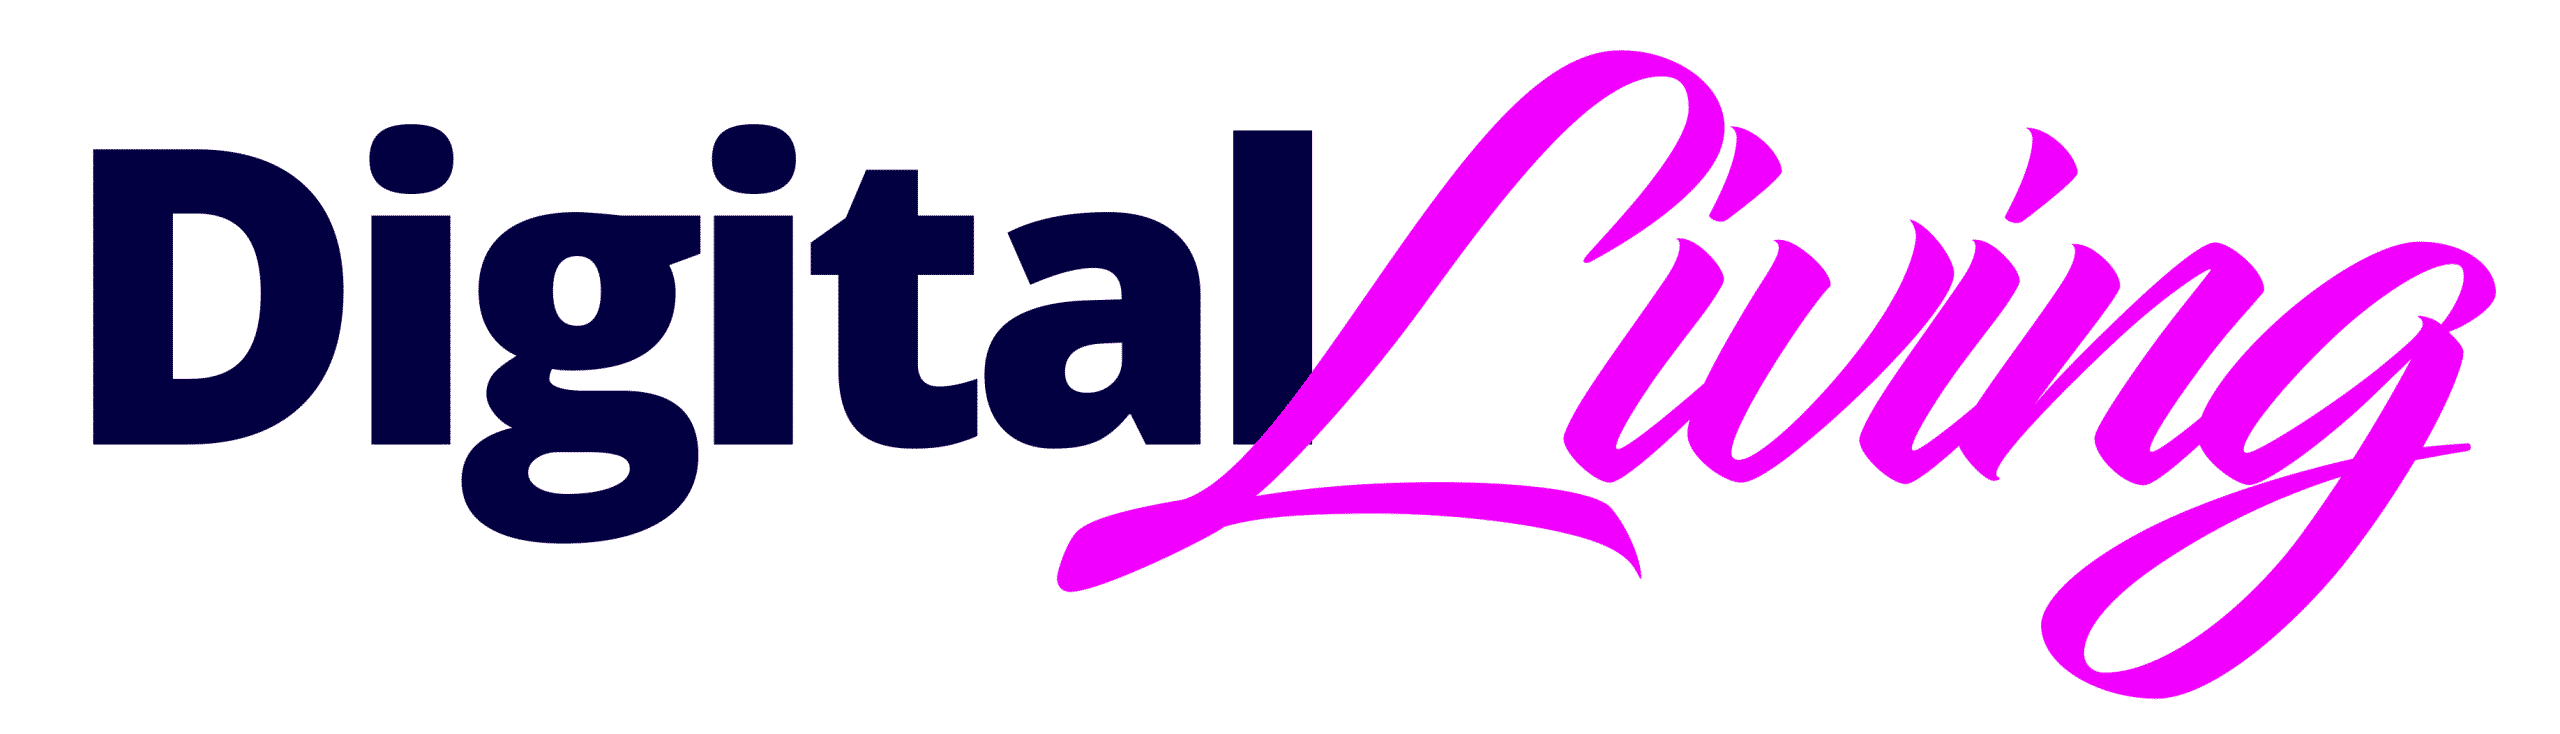 Digitalliving.ie